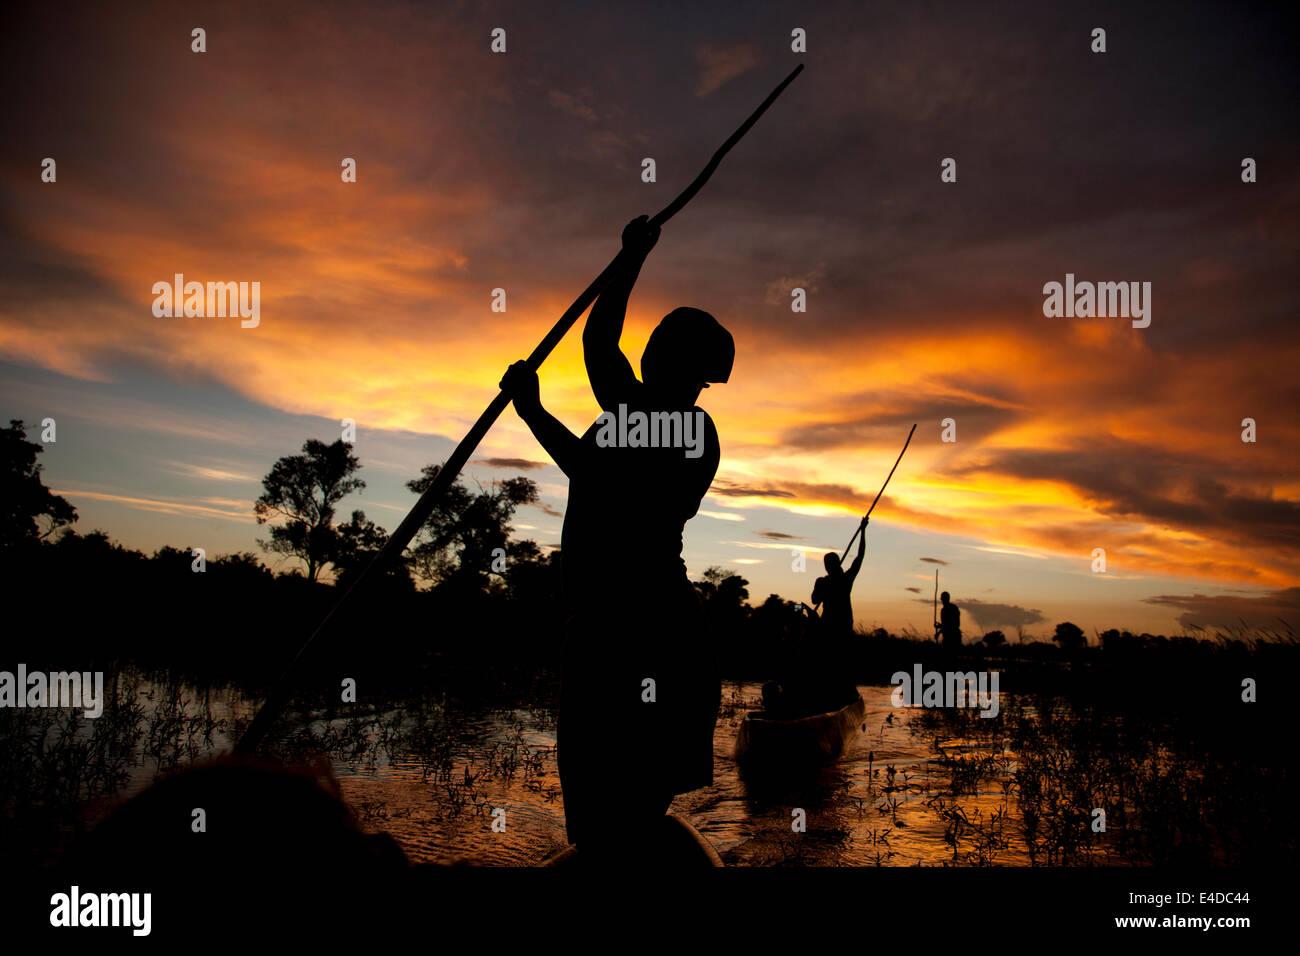 Poler on a traditional mokoro boat in the Okavango Delta at sunset, Botswana, Africa Stock Photo